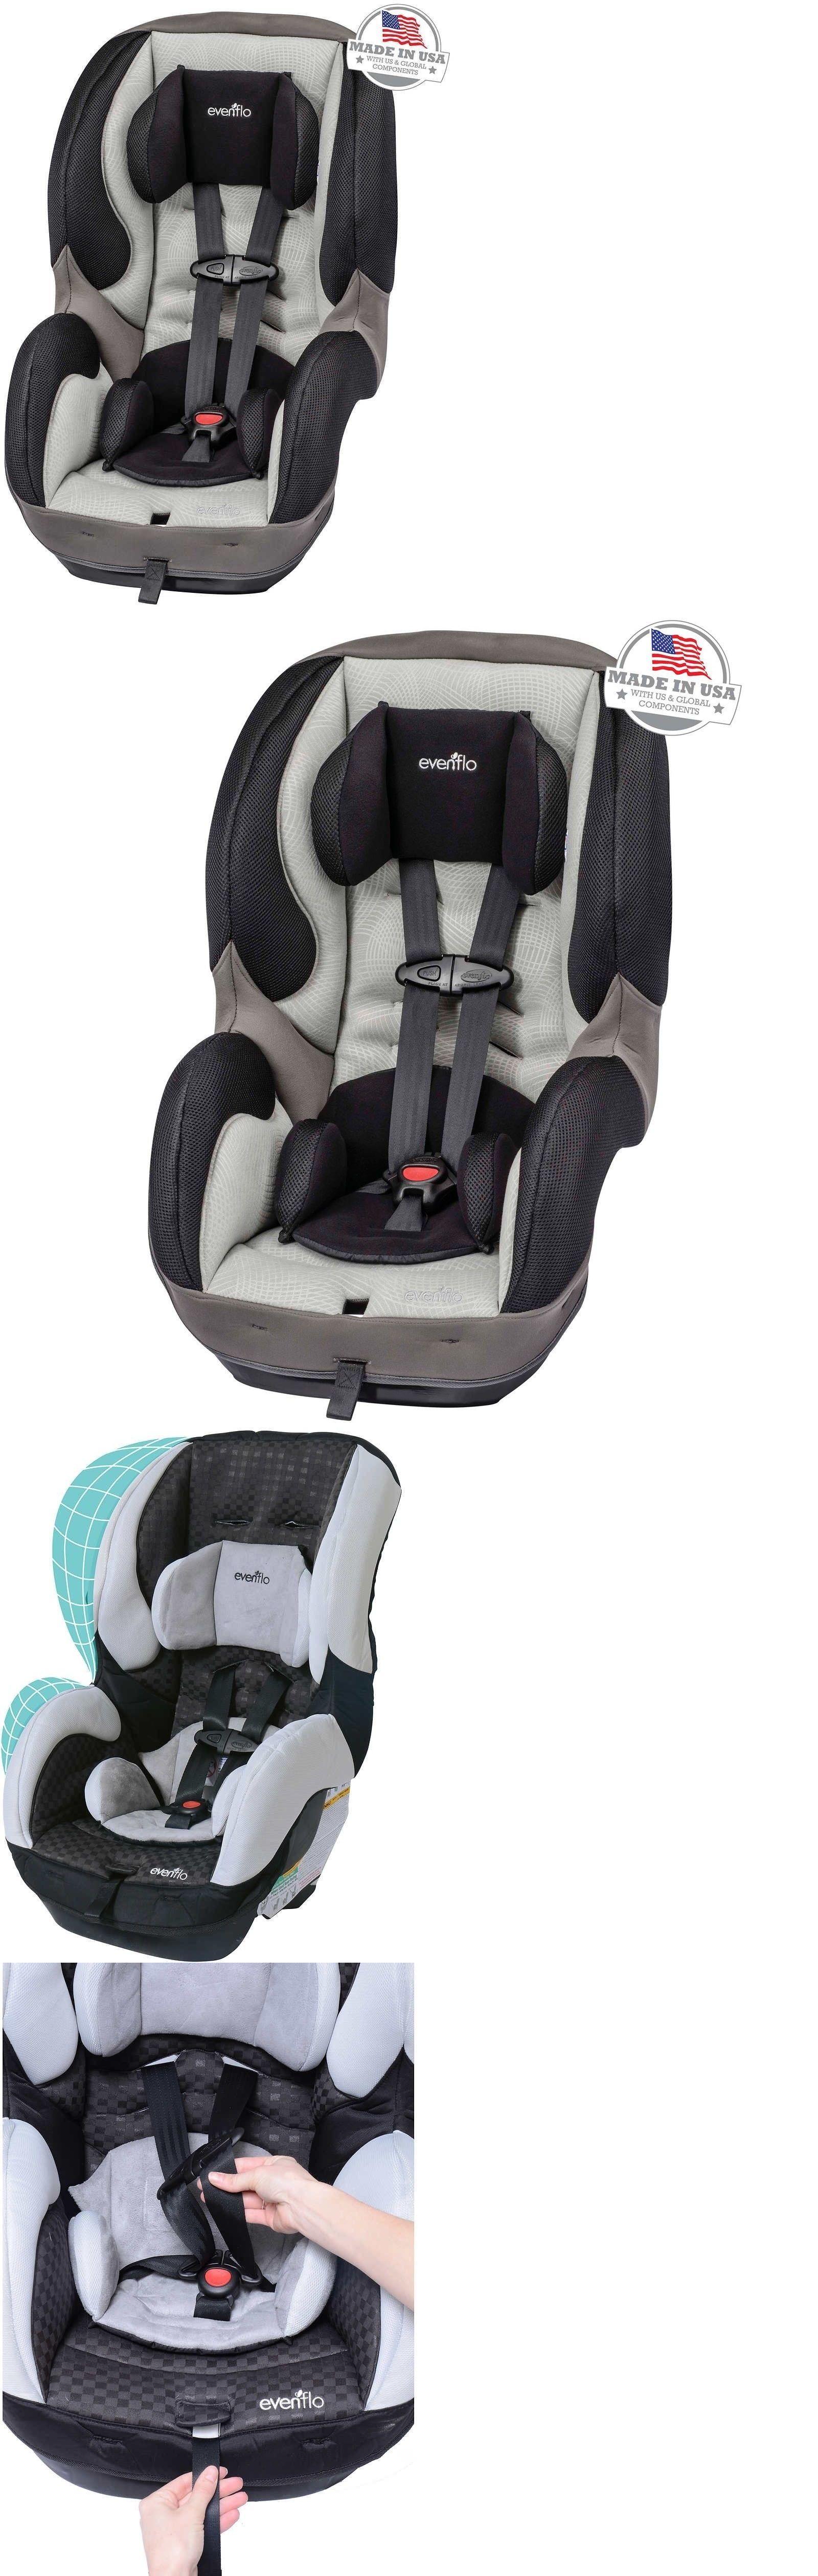 Convertible Car Seat 5 40lbs 66695 Sale Evenflo Sureride 65 Dlx Paxton